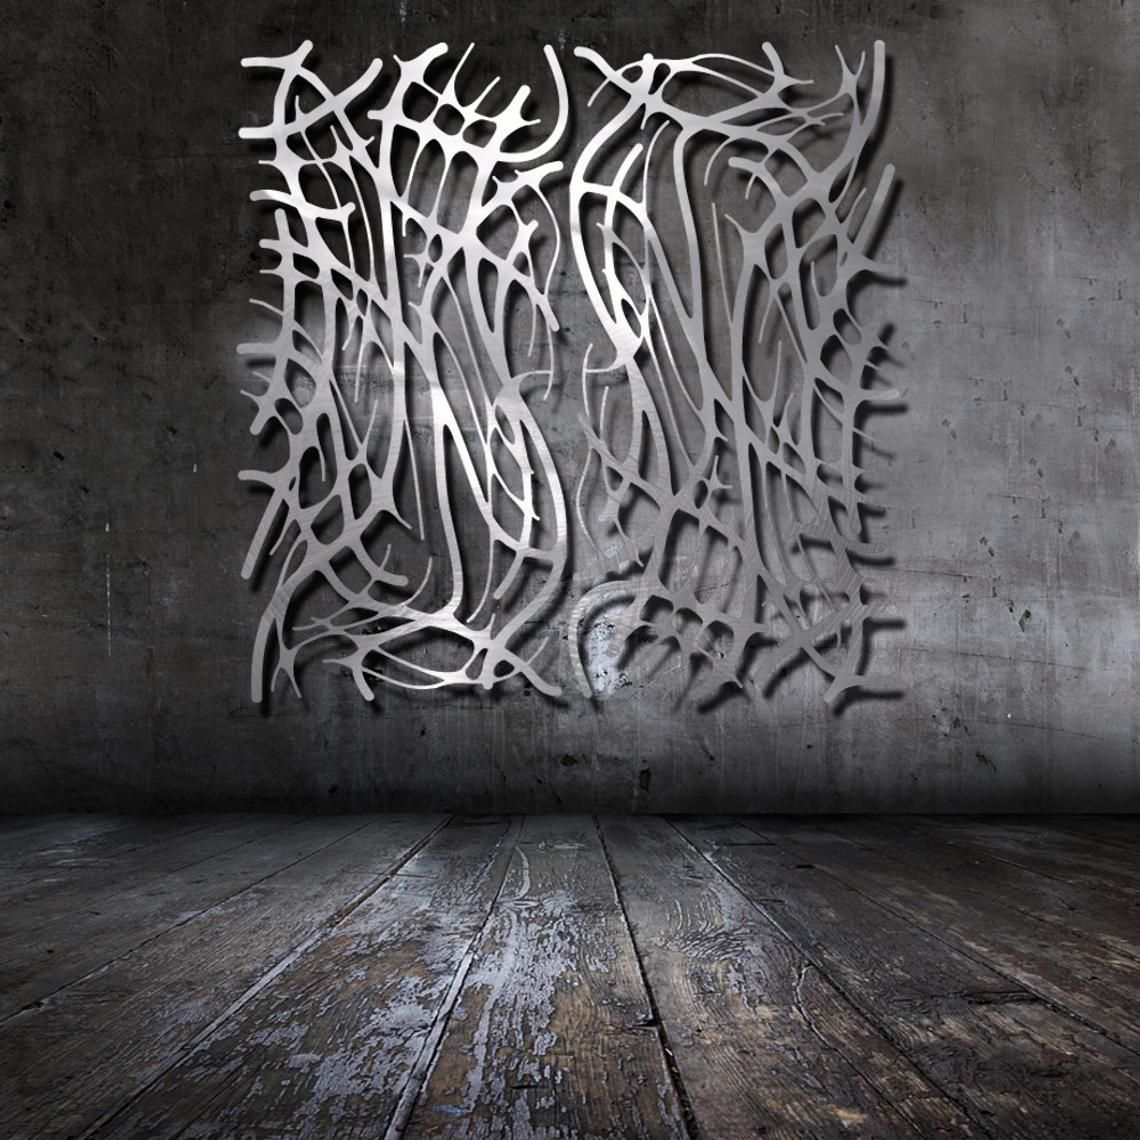 Modern Wall Art With Organic Forms Art Nouveau Web No 8 Pair Etsy Wall Sculpture Art Stainless Steel Wall Art Metal Wall Art